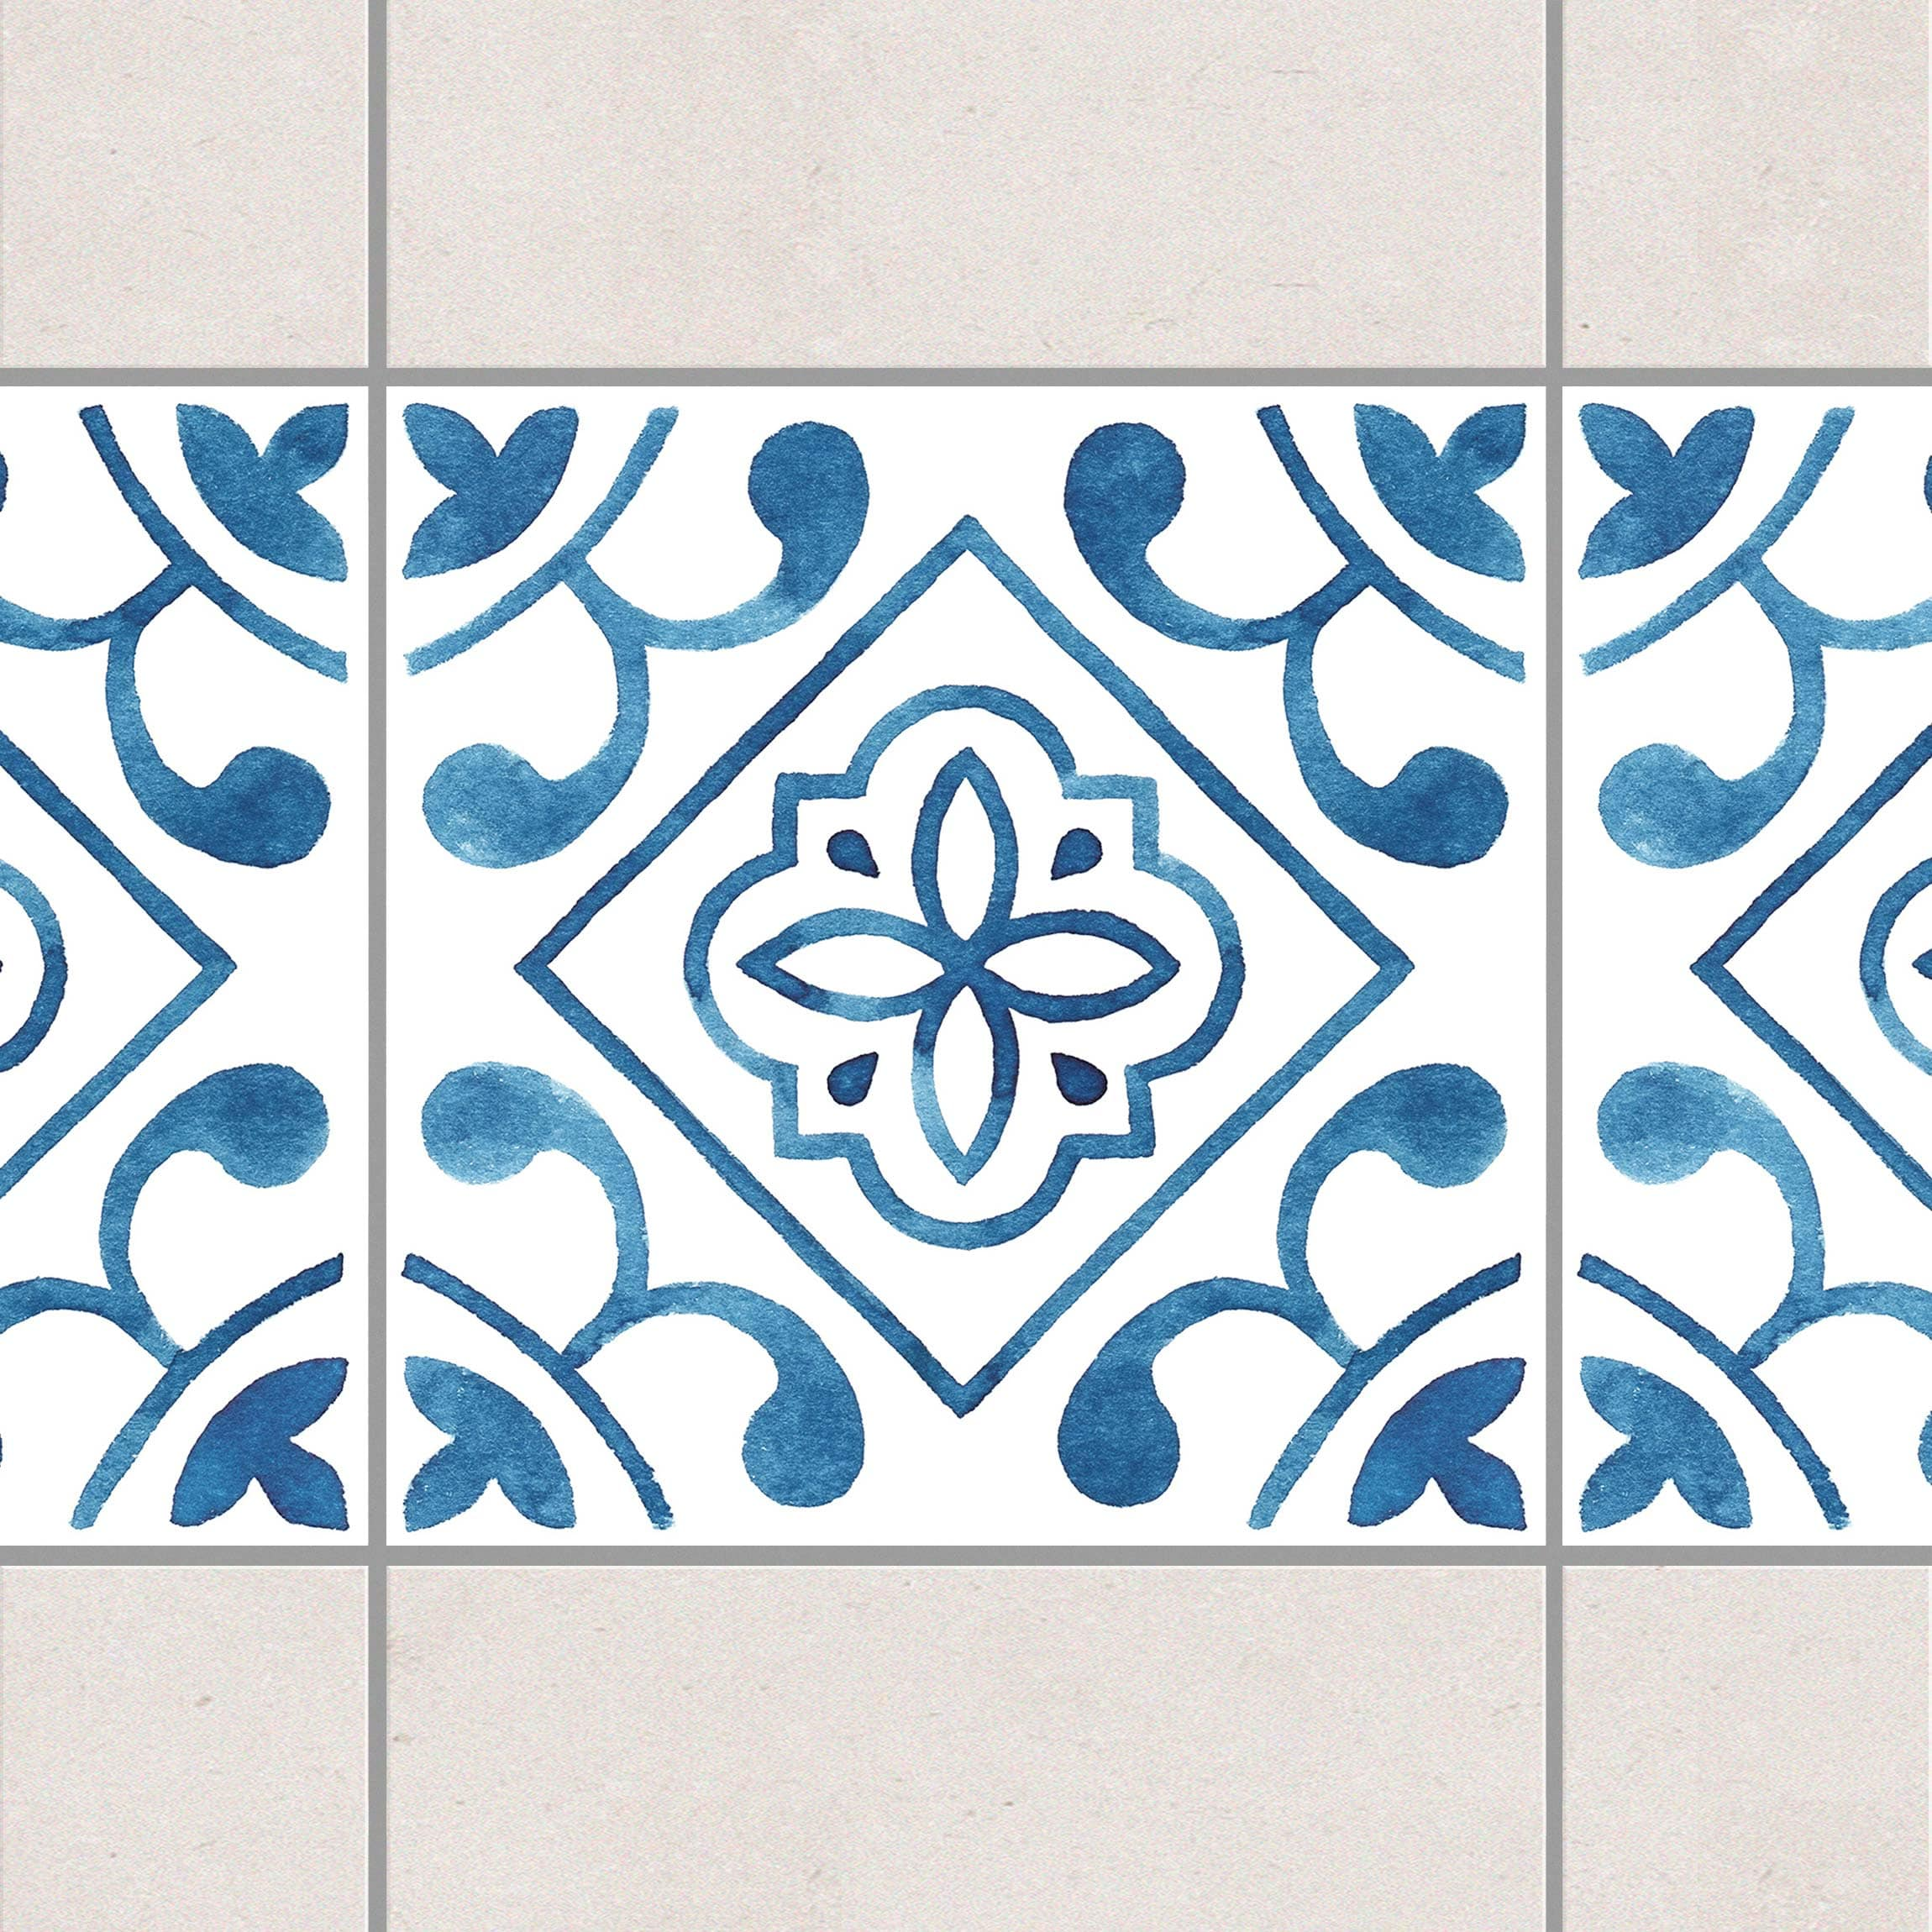 fliesen bord re muster blau wei serie no 2 1 1 quadrat 20cm x 20cm fliesenaufkleber. Black Bedroom Furniture Sets. Home Design Ideas